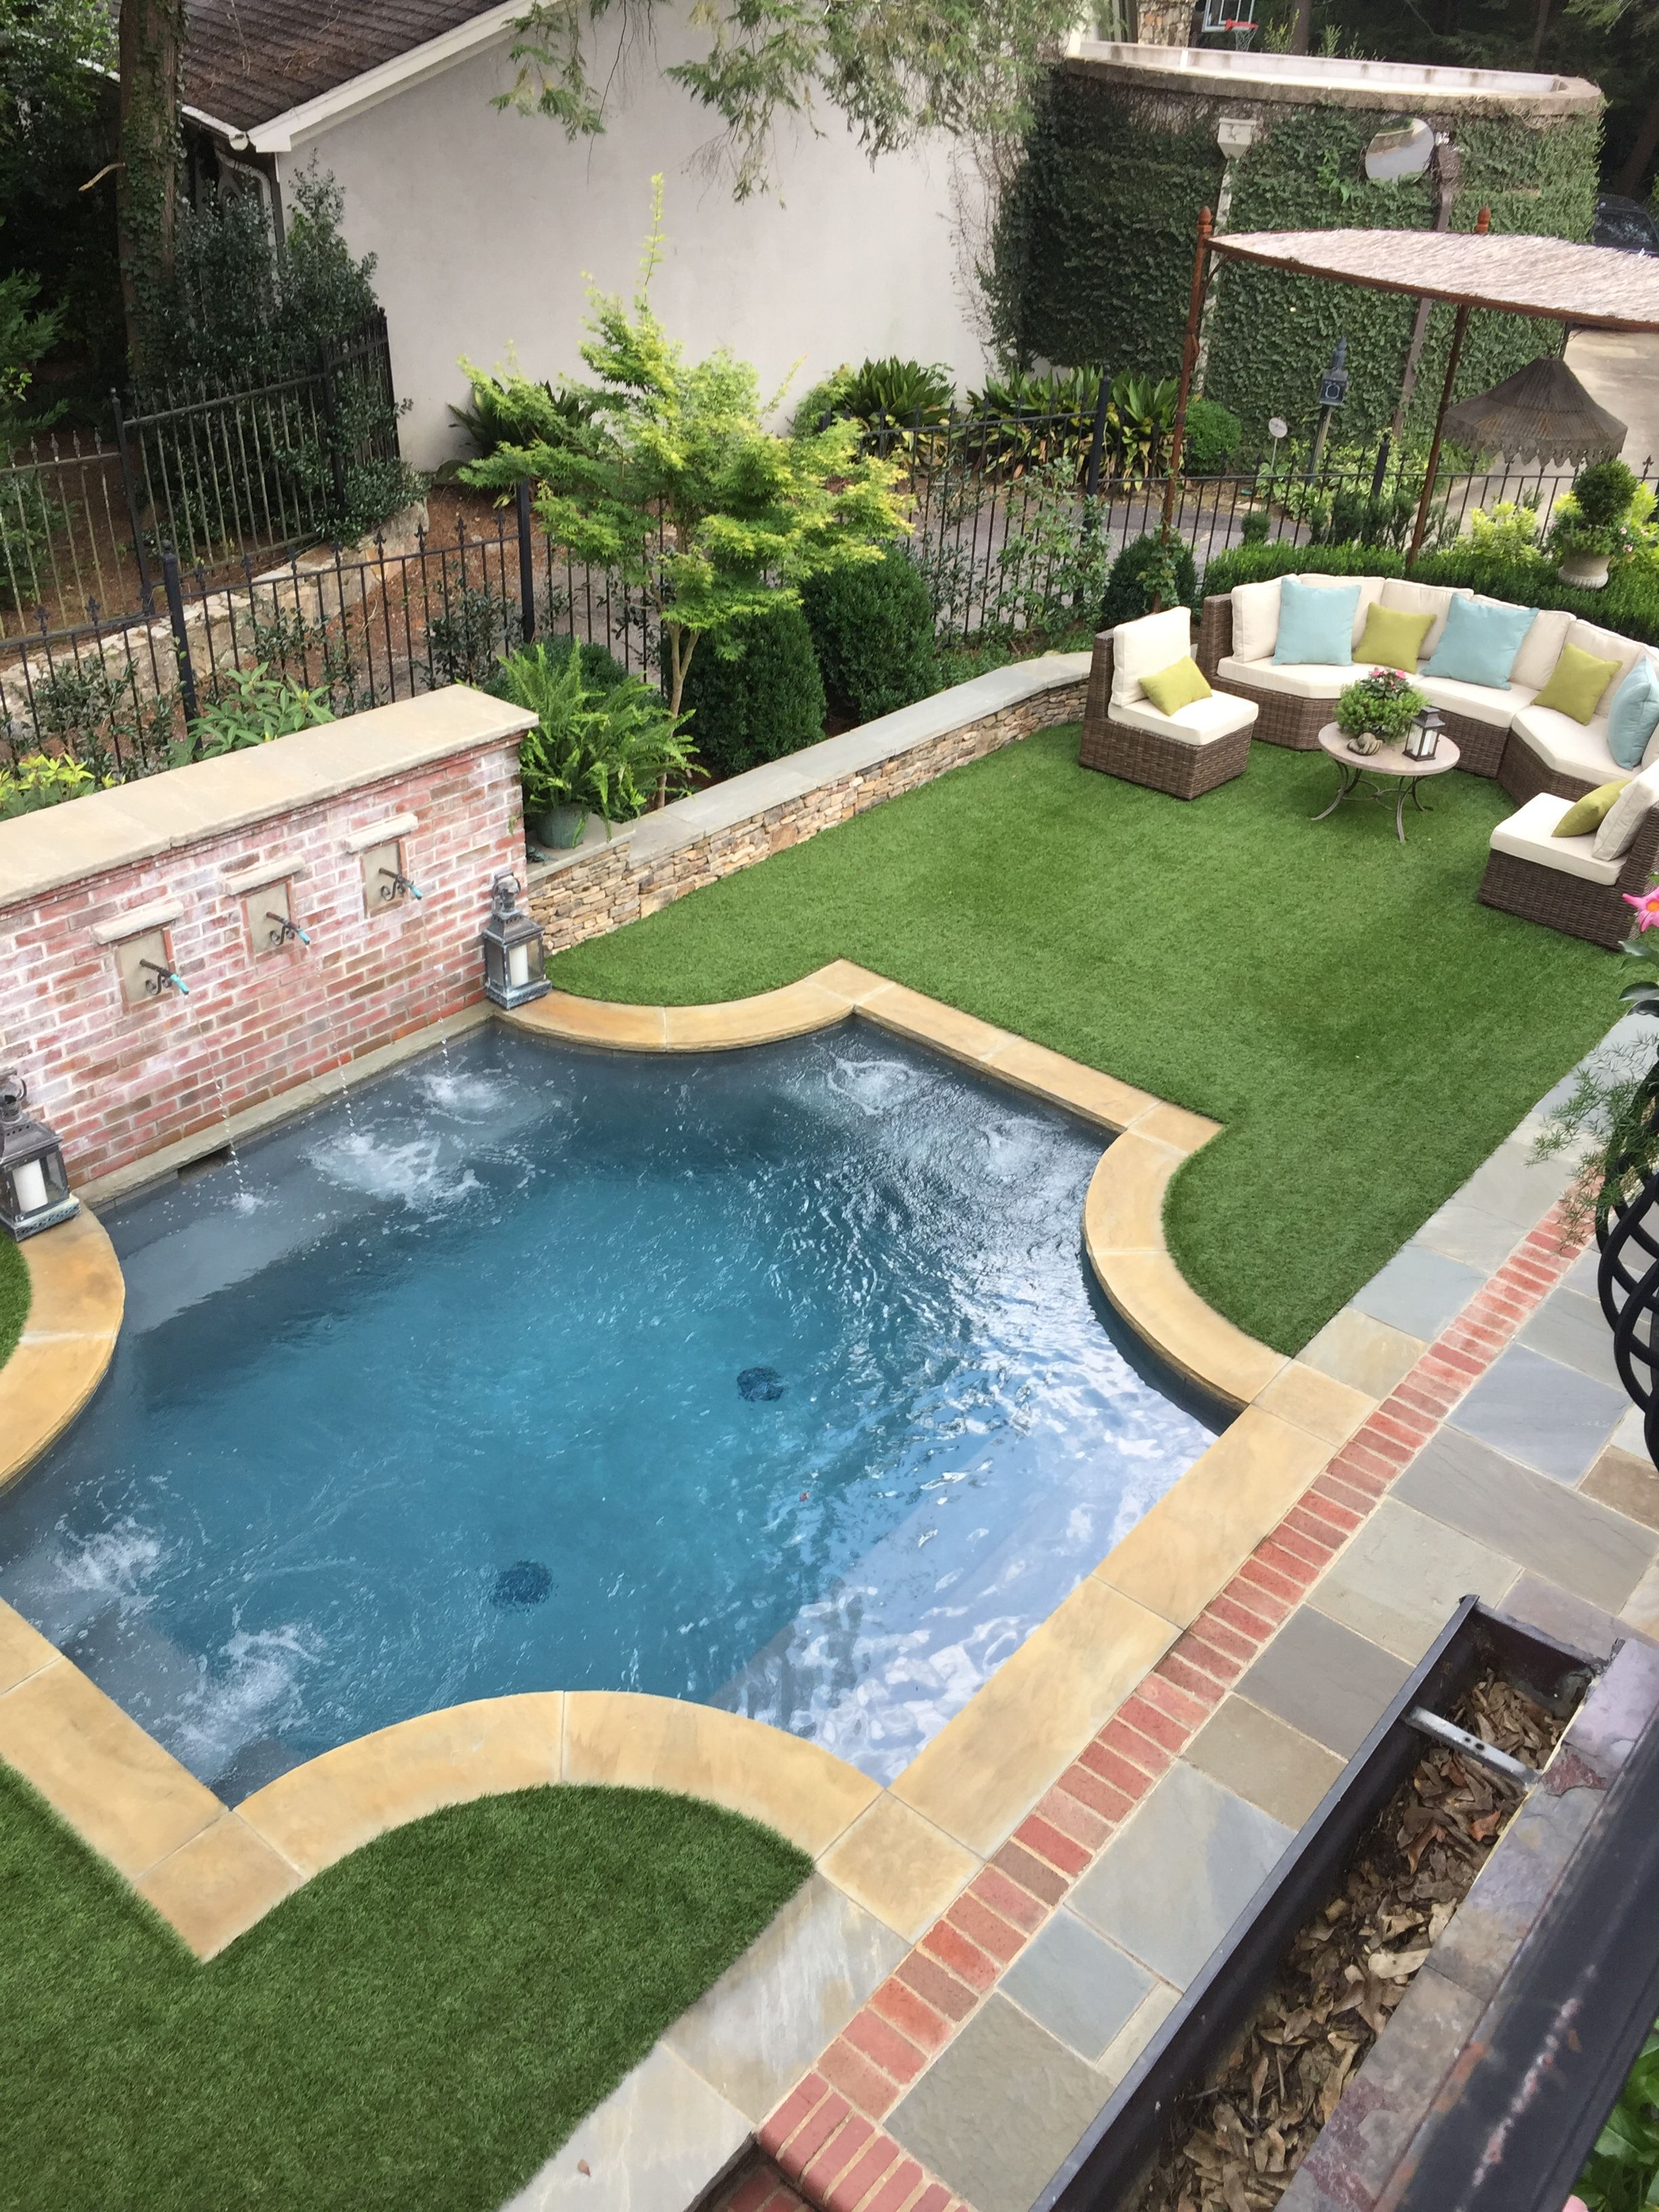 Pin By Farzad Dehghani On Gardening Small Backyard Pools